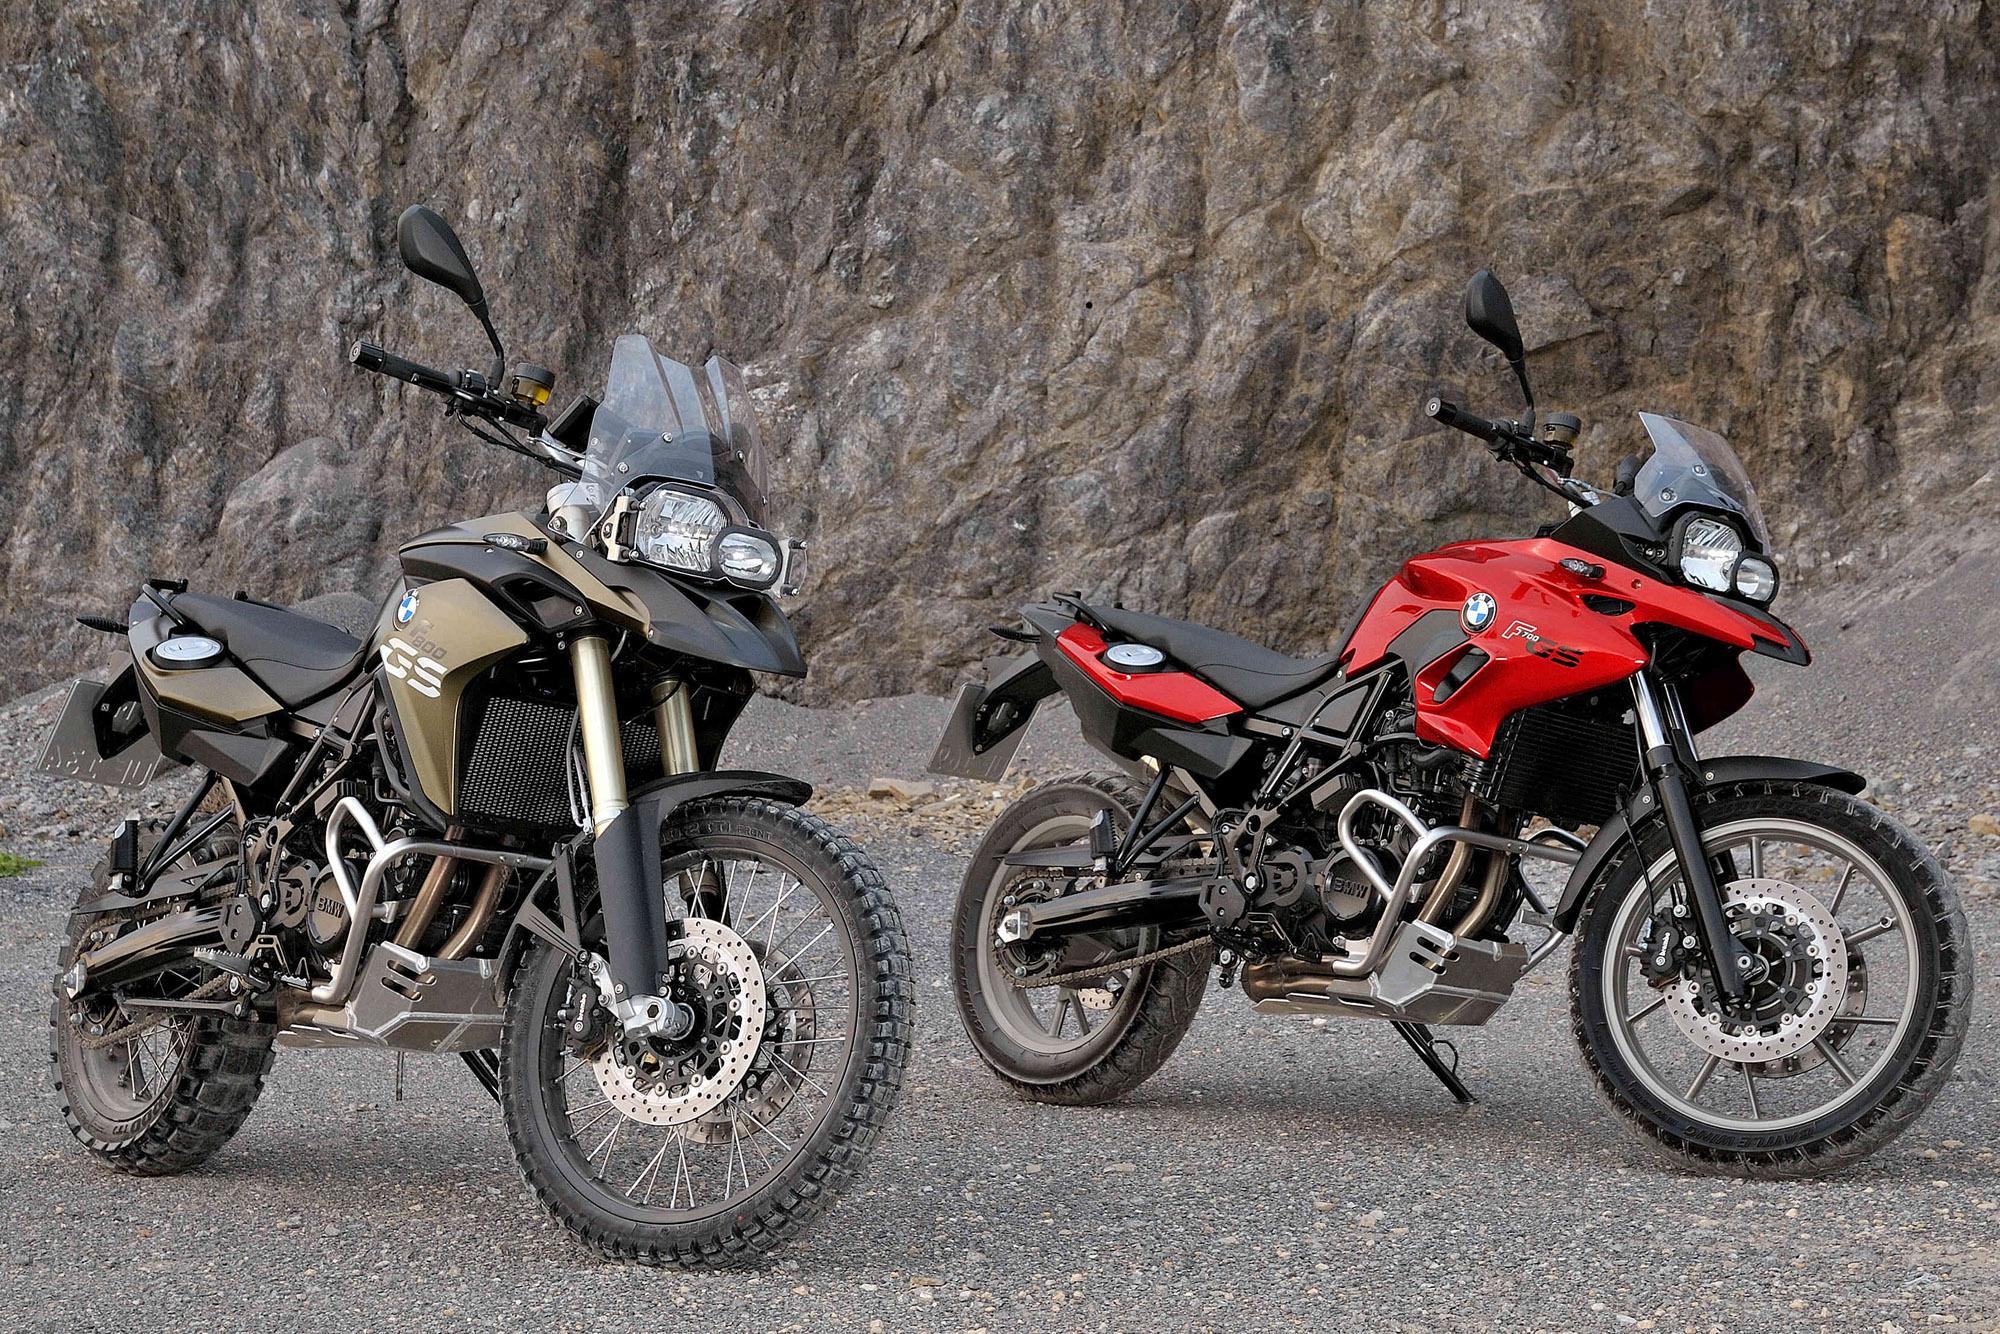 Top 10 brand-new adventure bikes under 1000cc